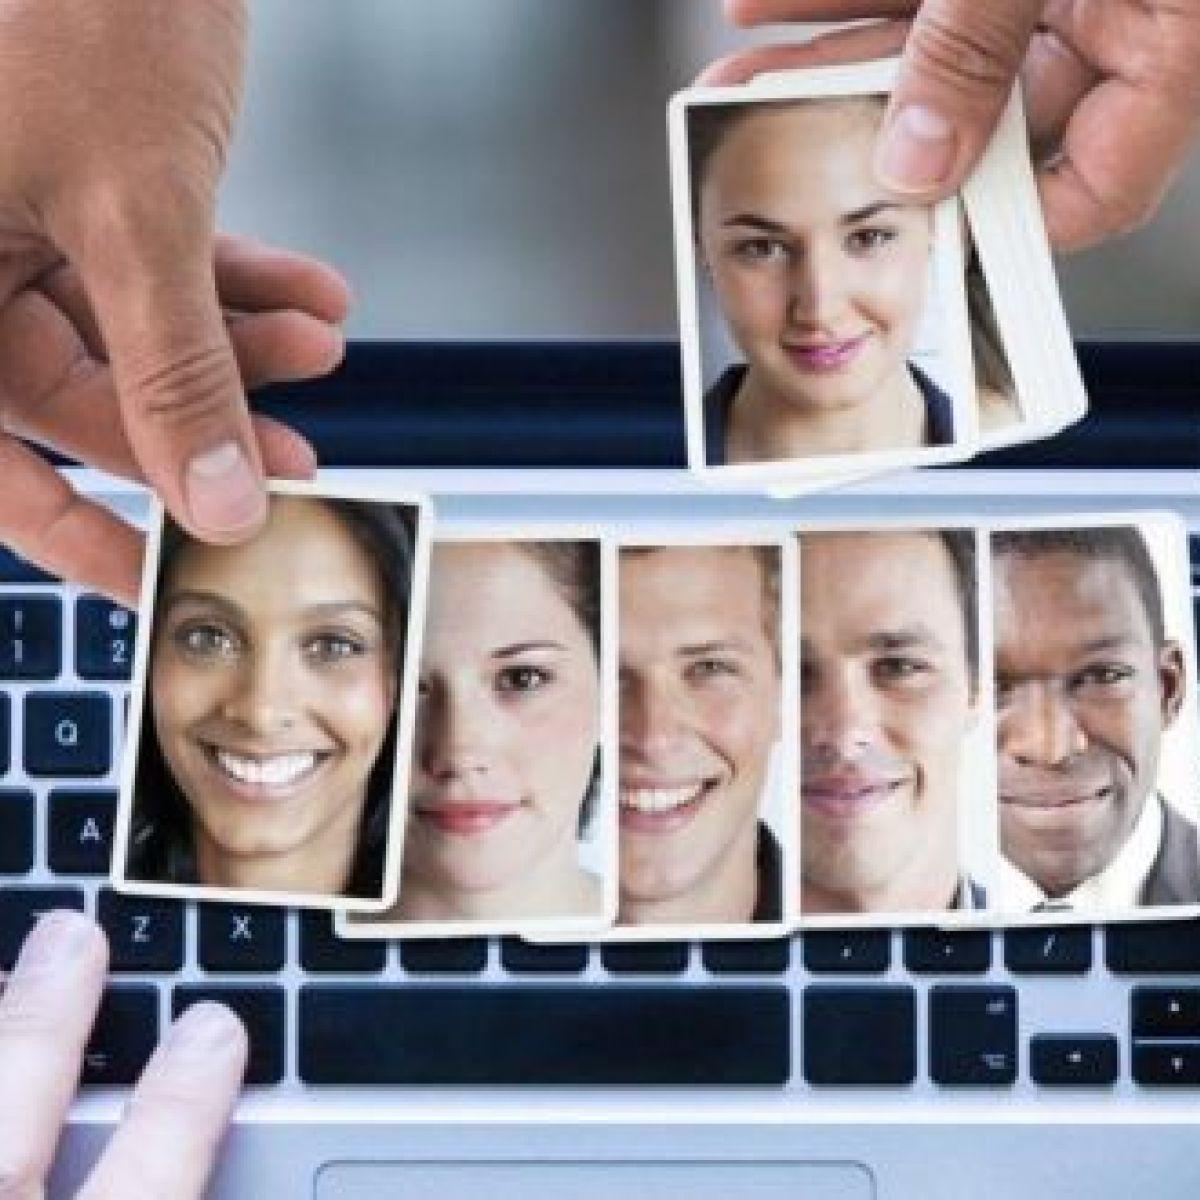 potteriespowertransmission.co.uk - Irelands largest online dating site. Meet